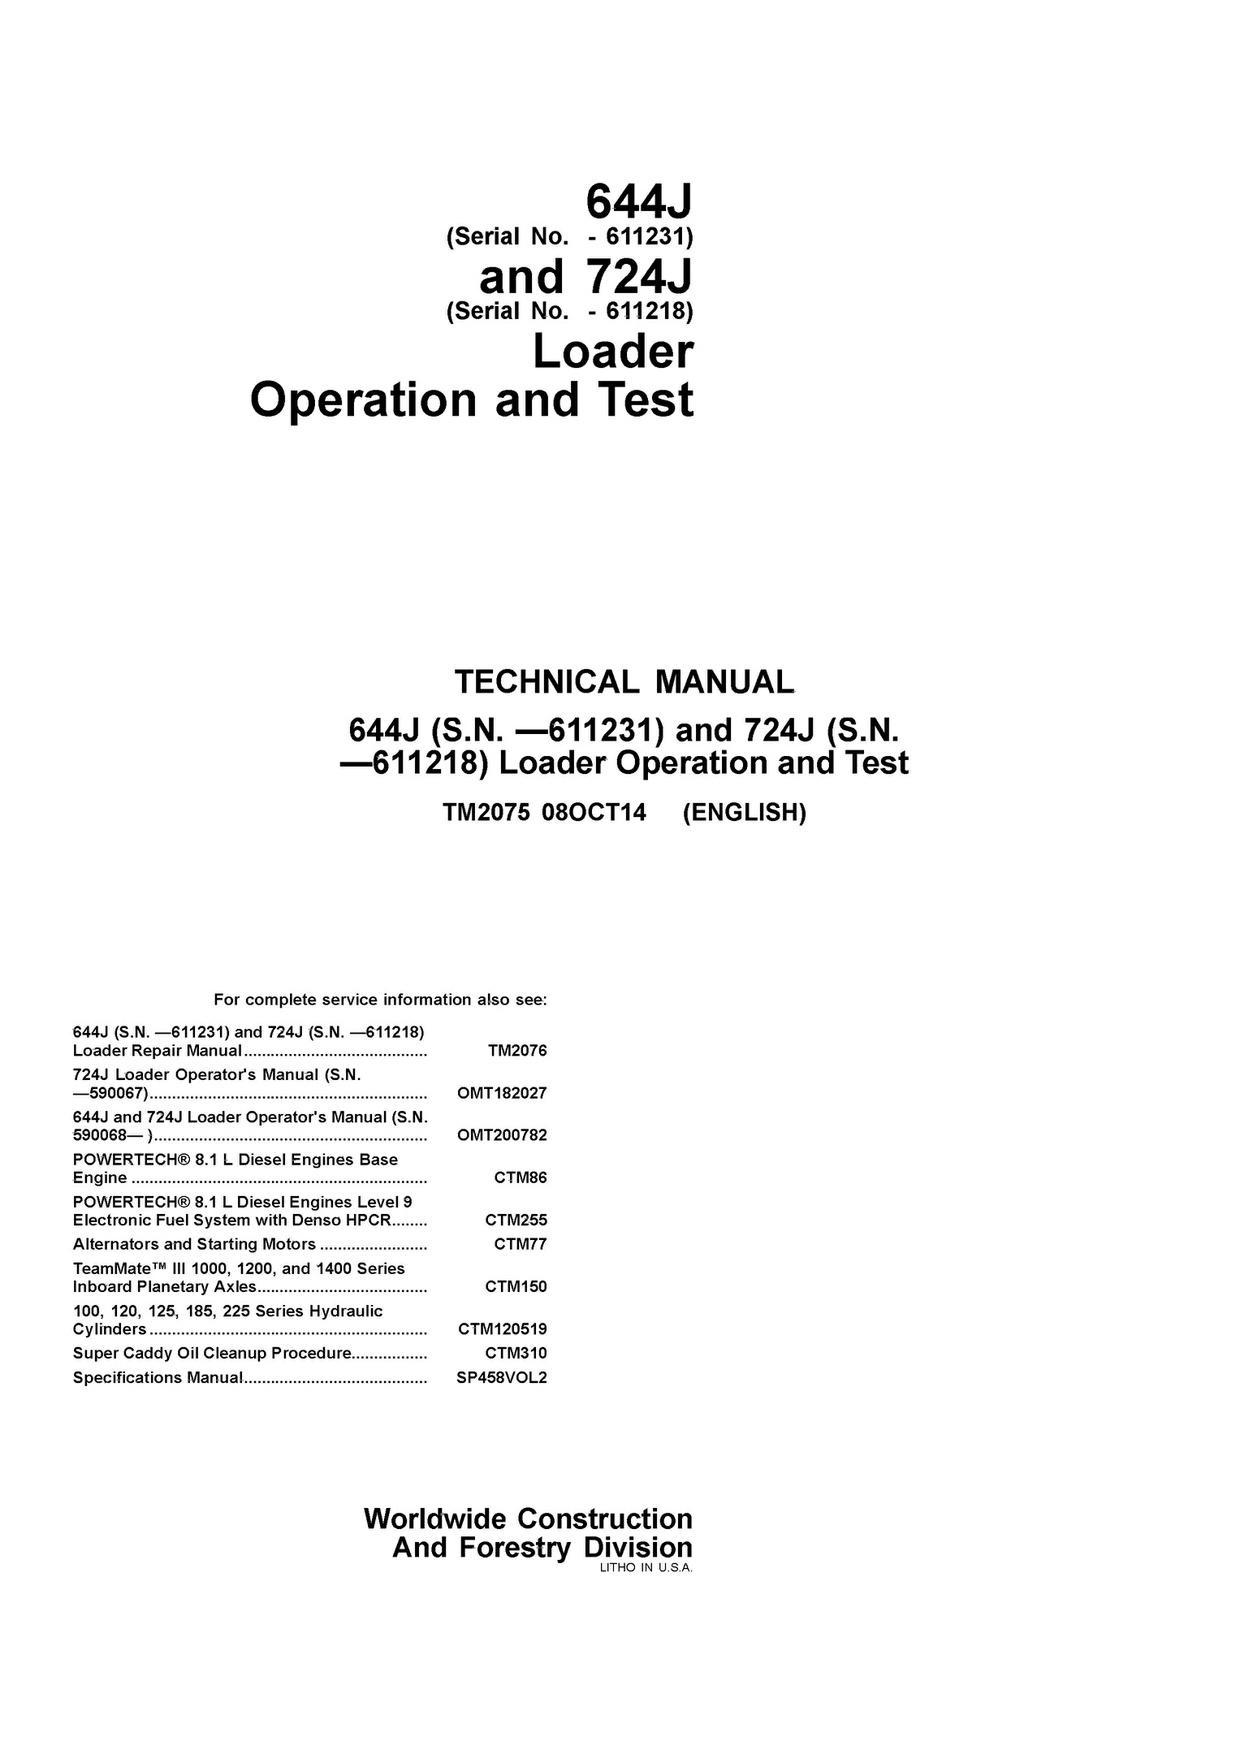 ecfe706d92eab8aeaf3158d58b5cc516?resize\\\=665%2C941\\\&ssl\\\=1 wiring diagram for a 410g backhoe john deere 410g backhoe specs Caterpillar Backhoe Parts Diagram at virtualis.co